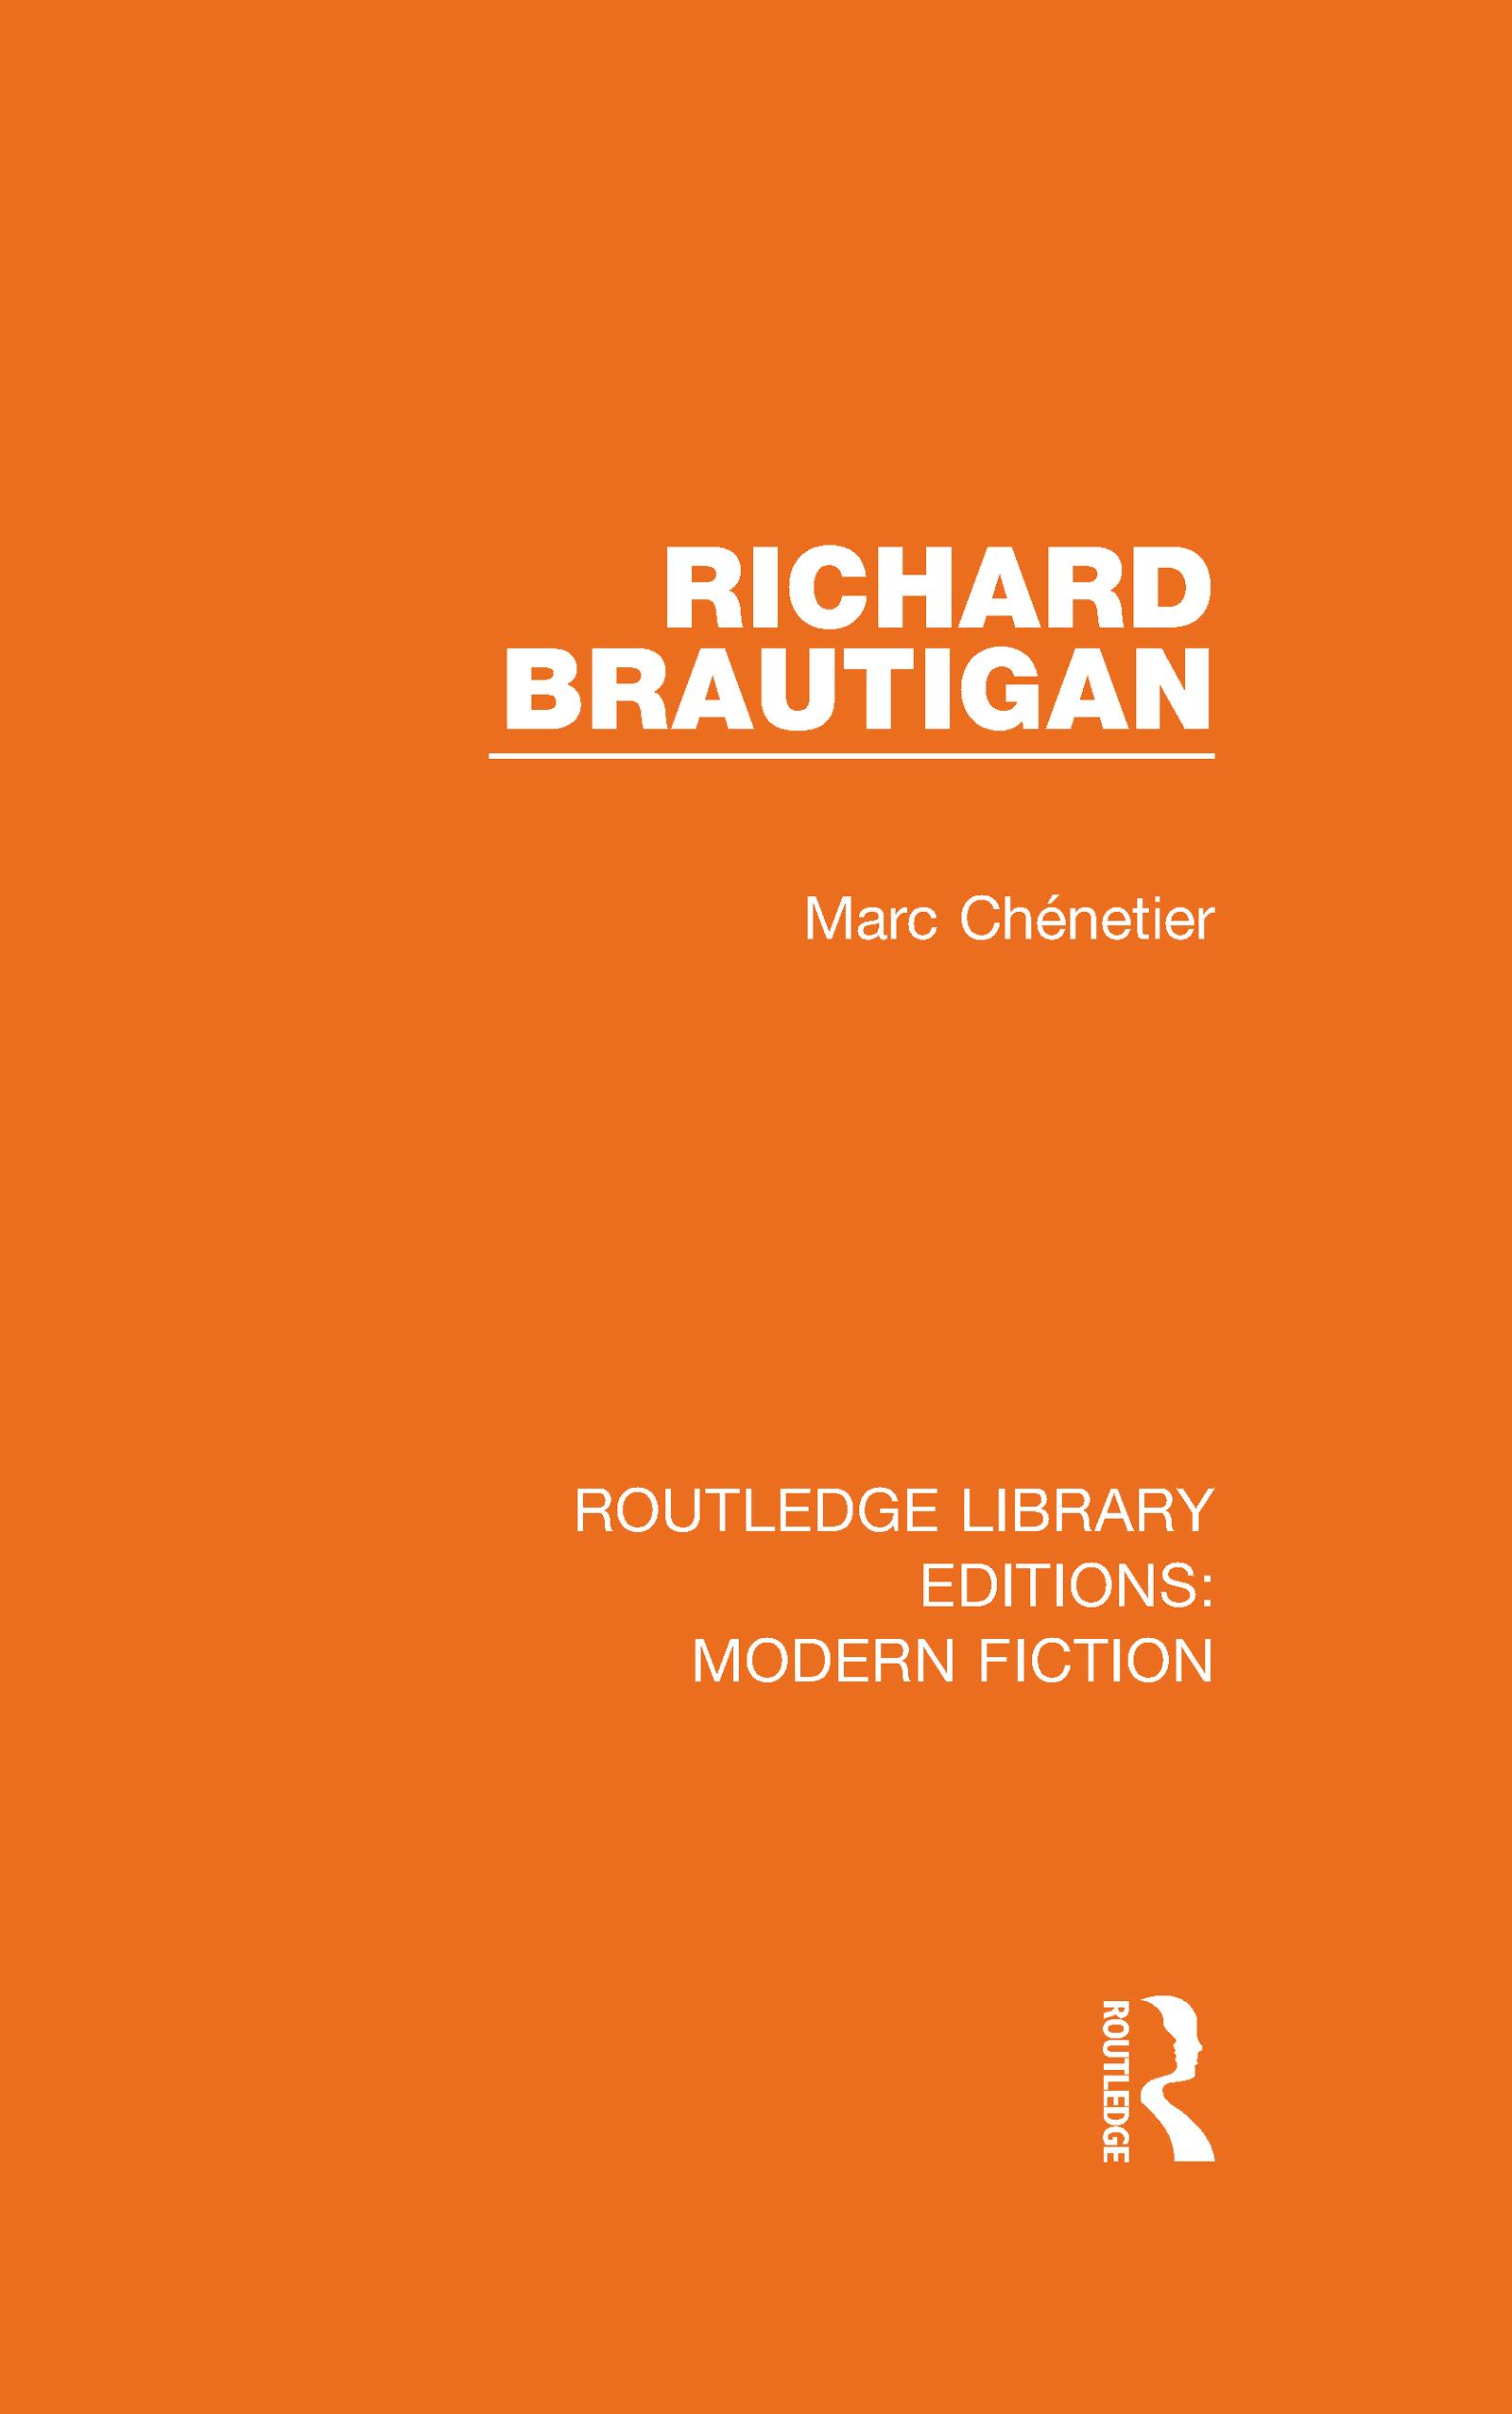 Richard Brautigan